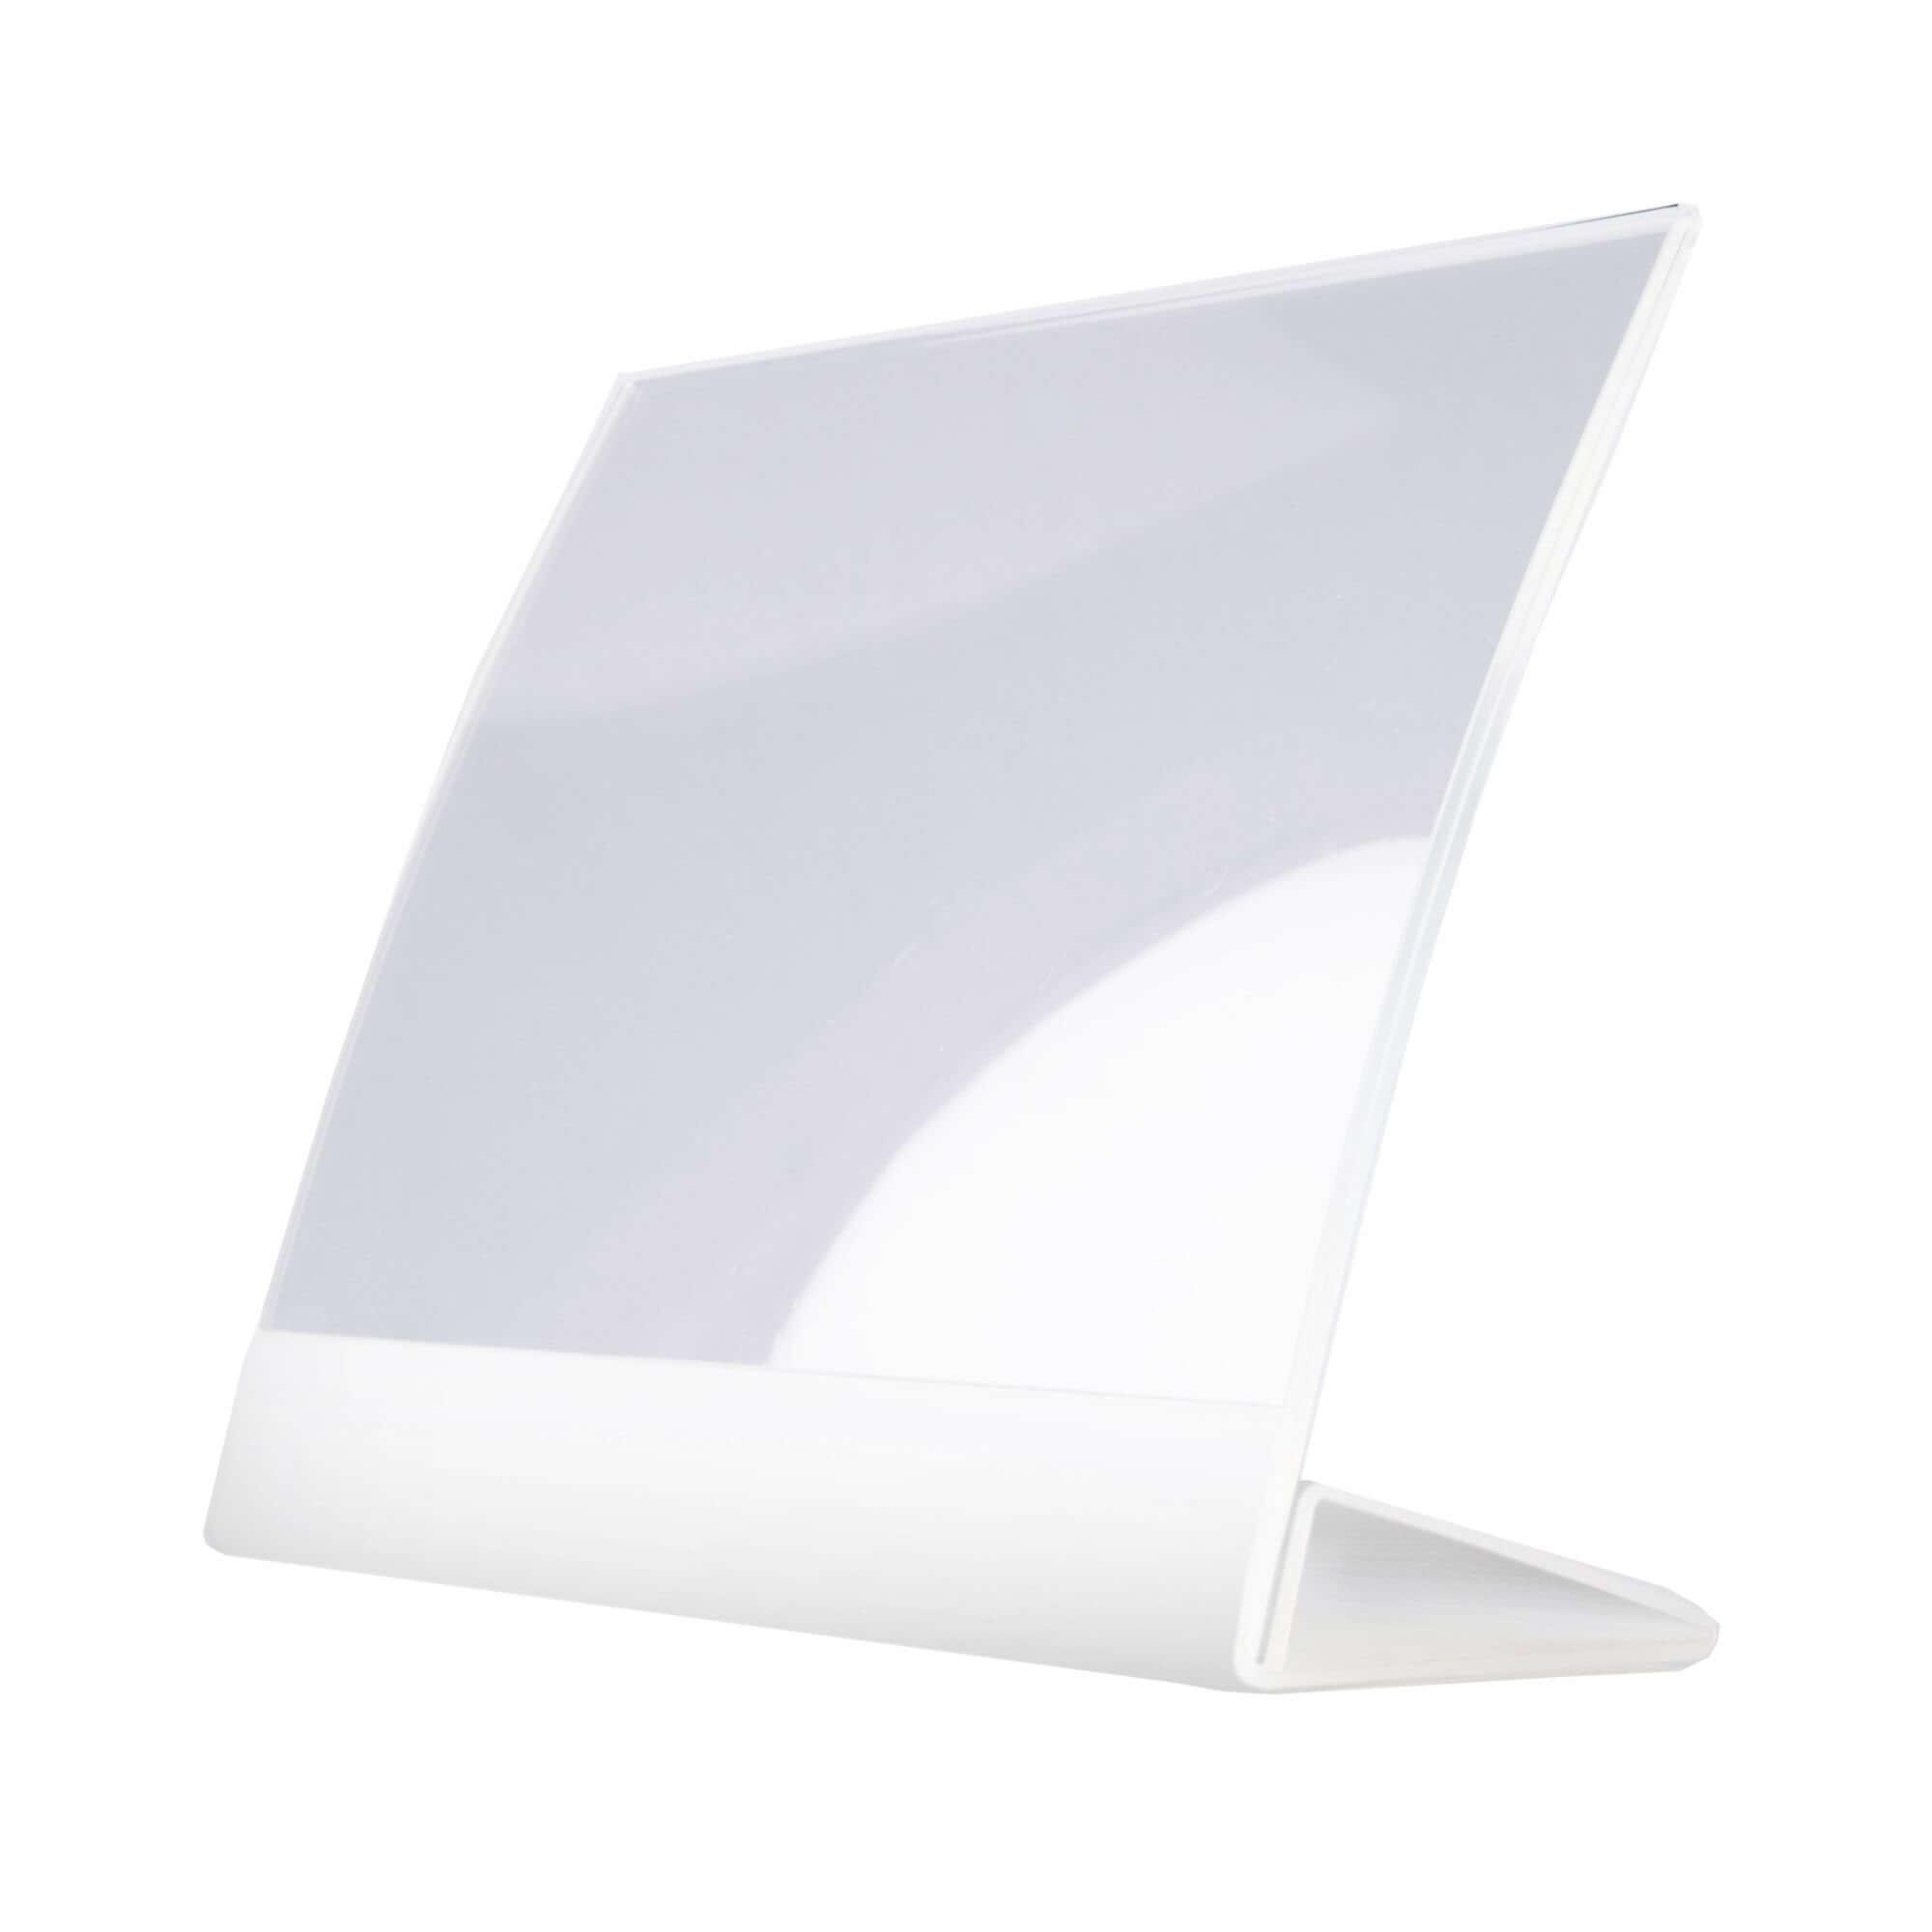 hochwertiger Prospektsteller aus Acrylglas